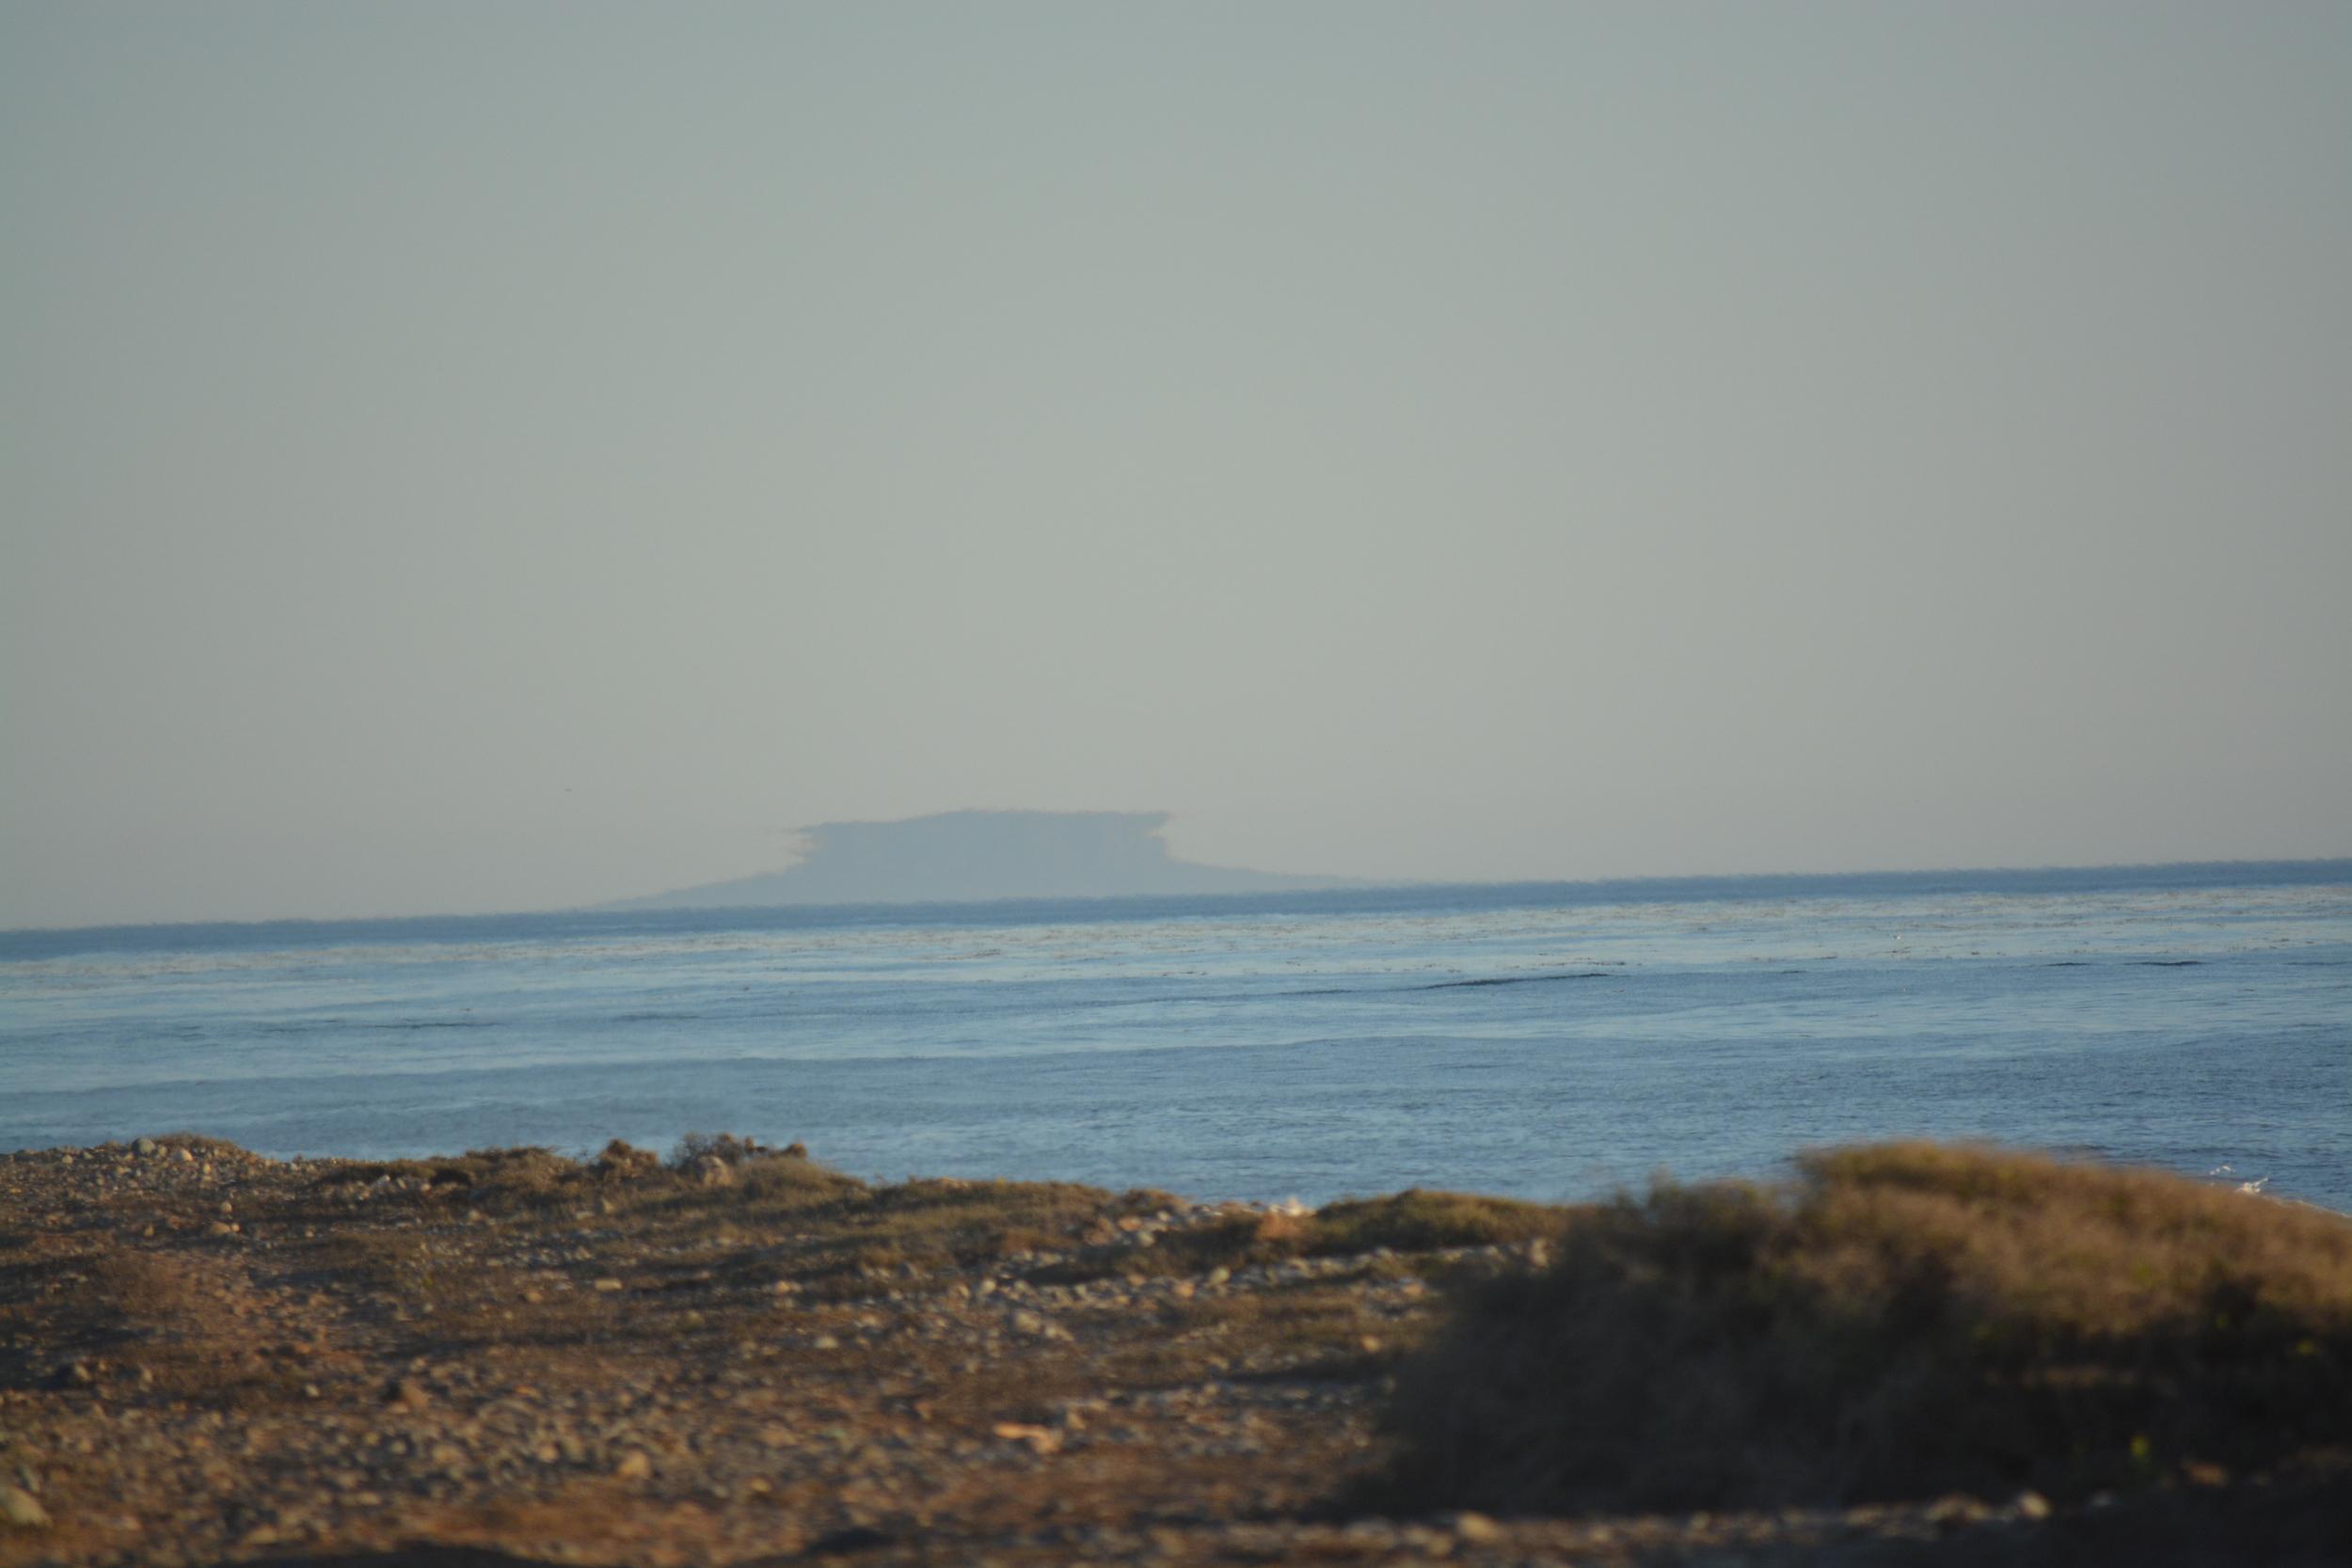 Baja California 10-5-13 Shipwrecks Surfing Adventure Ocean Experience Surf School San Diego (106).JPG